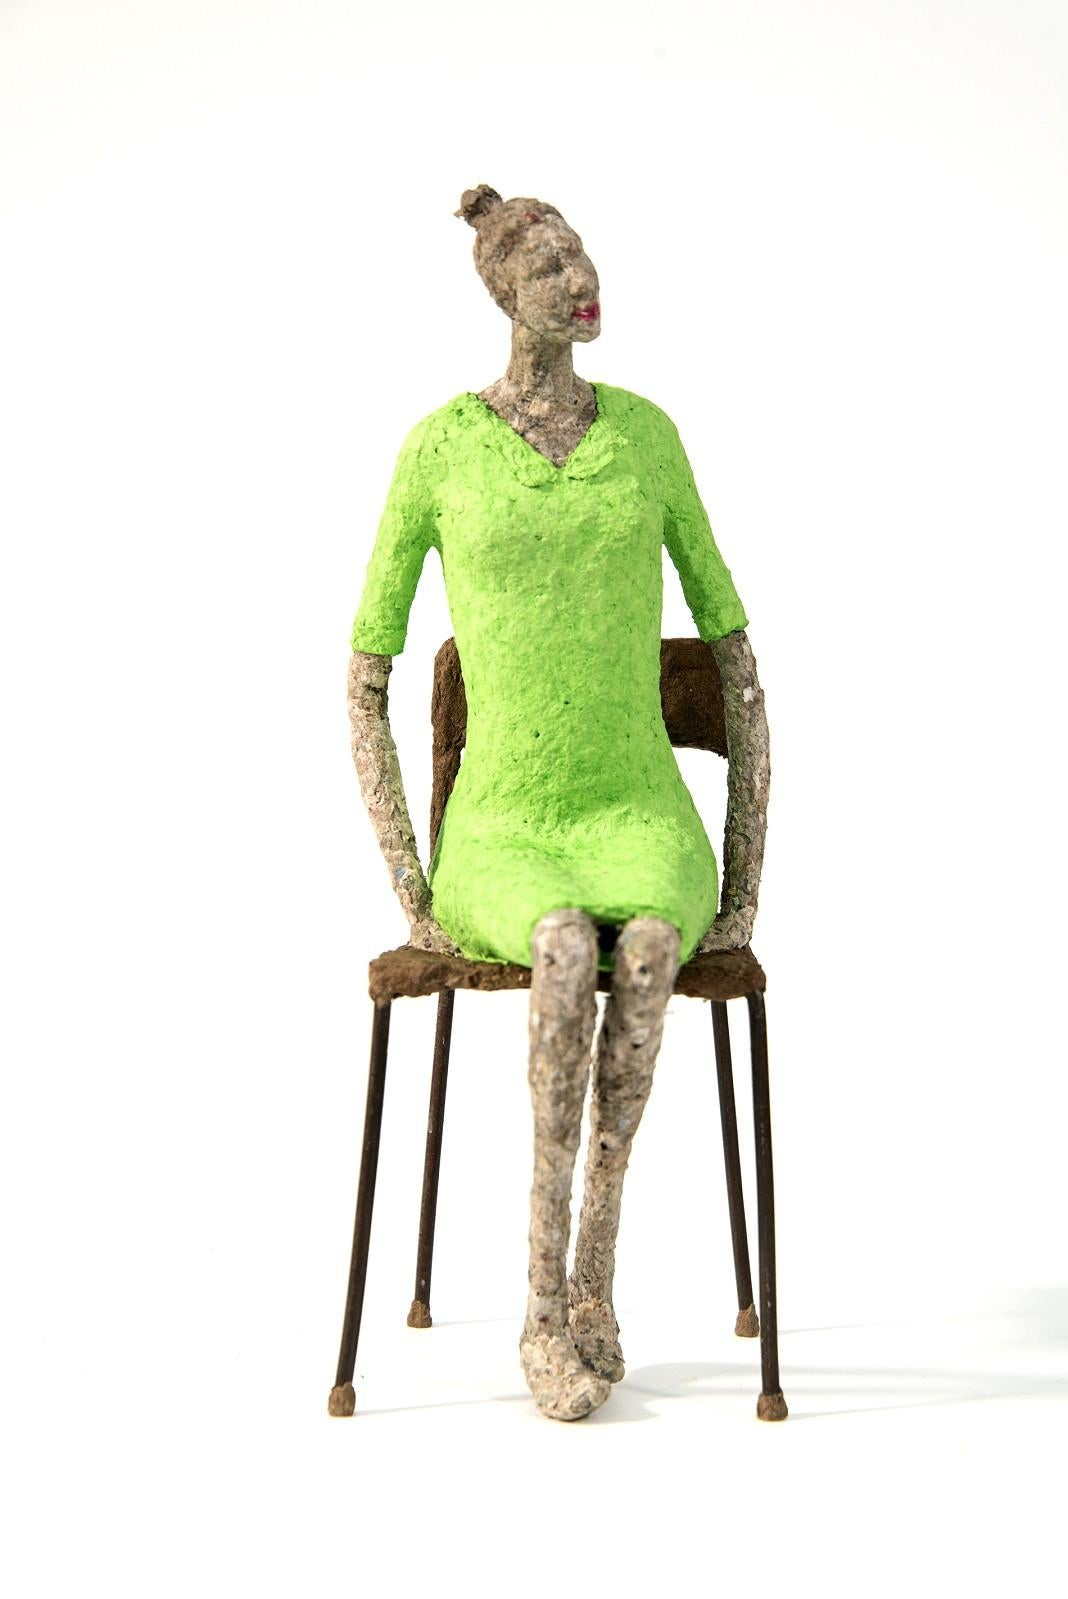 Pomme - bright, expressive, textured, figurative, female, paper mache sculpture